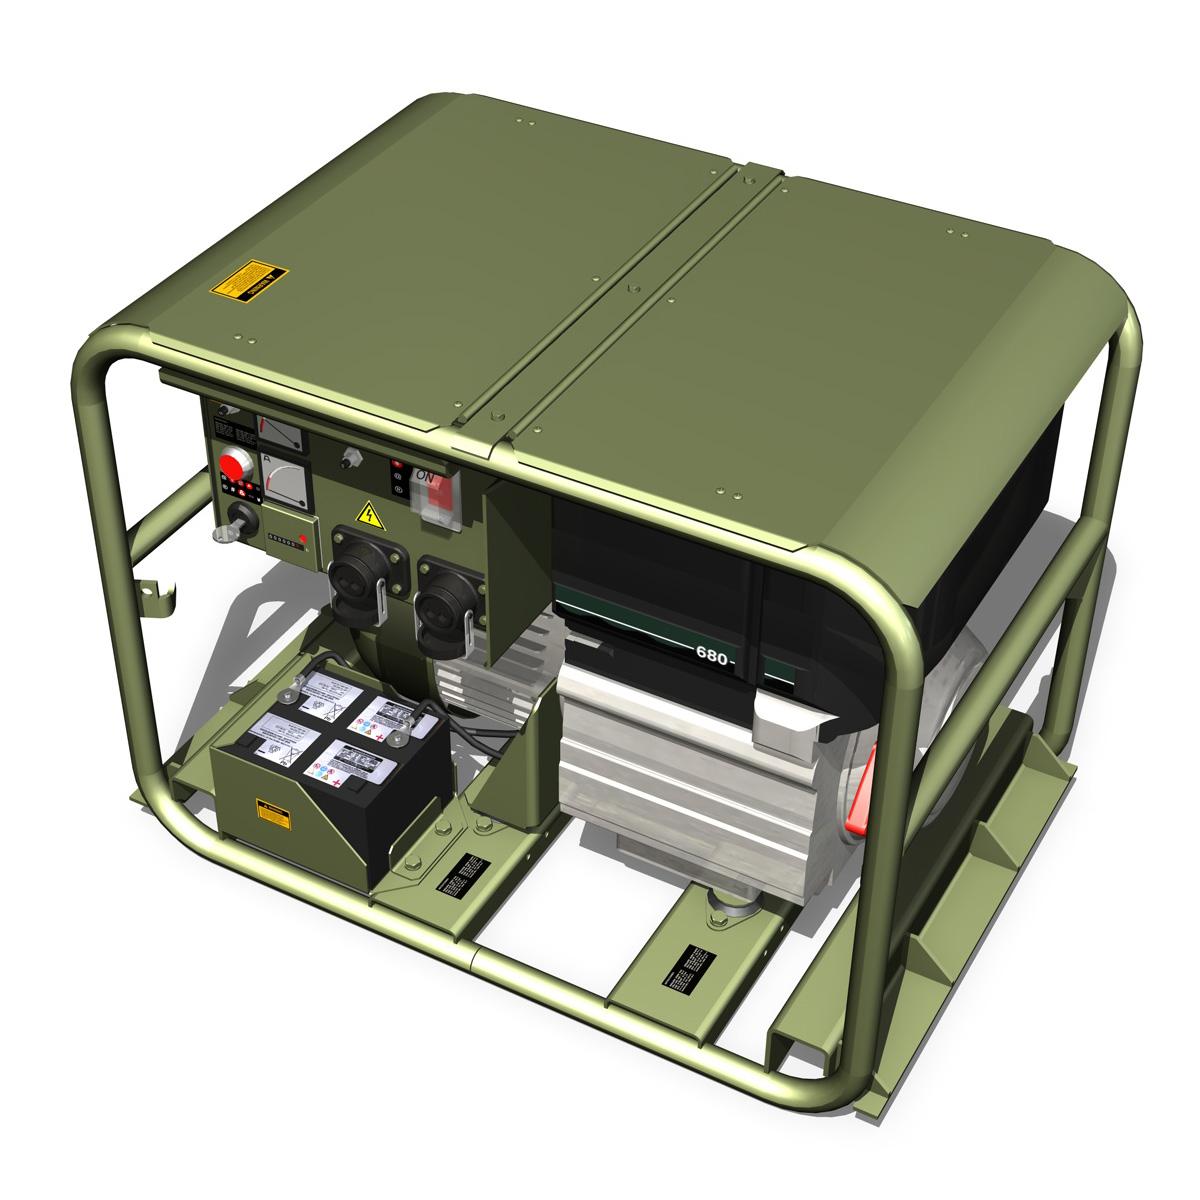 military diesel generator 3d model 3ds fbx c4d lwo obj 188560